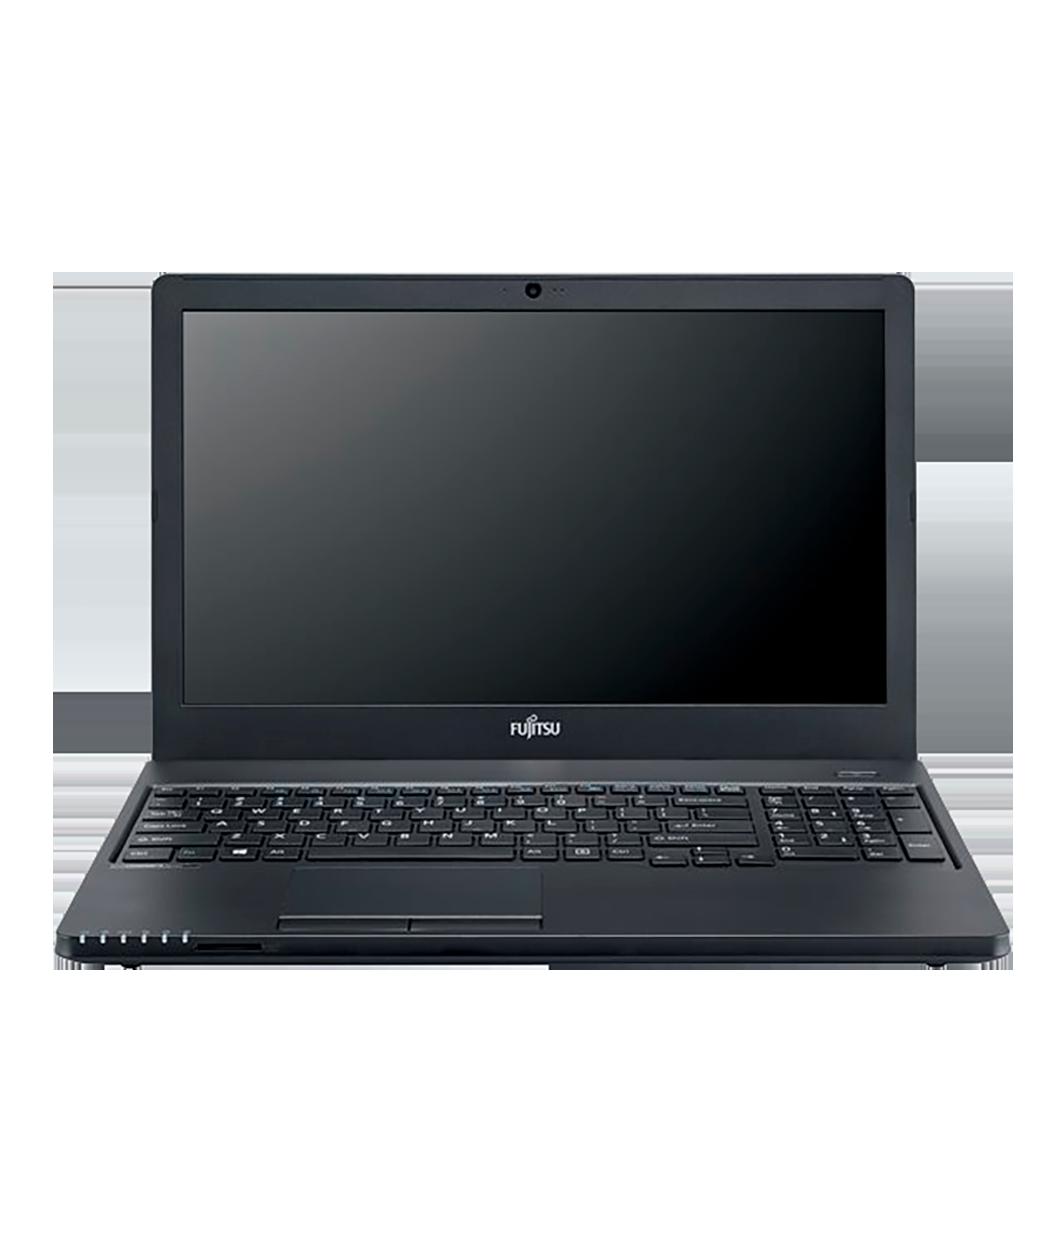 Fujitsu LIFEBOOK A555 128GB SSD